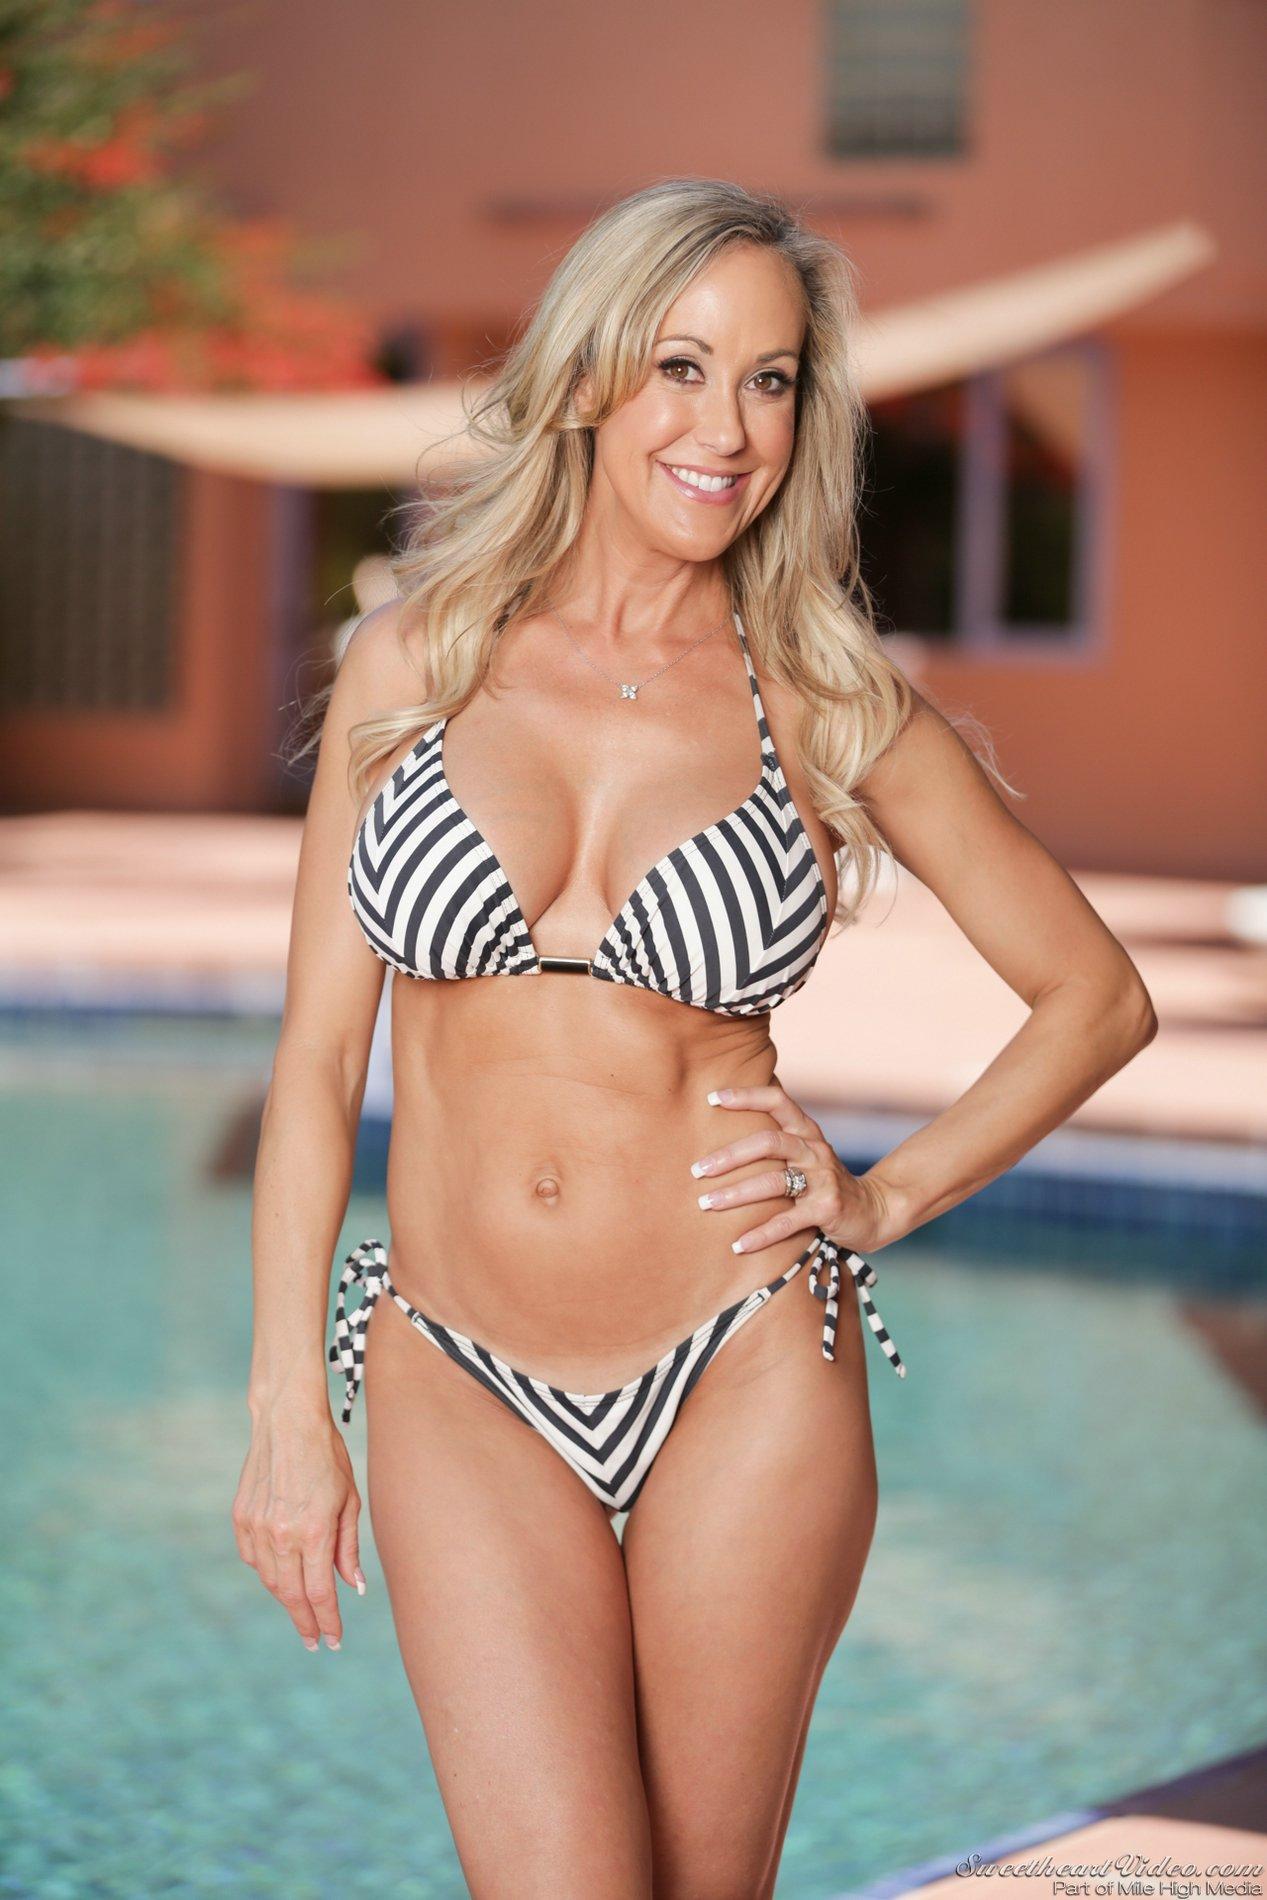 Bikini Love Porn - Hot bikini girl Brandi Love shows off her athletic body - My ...